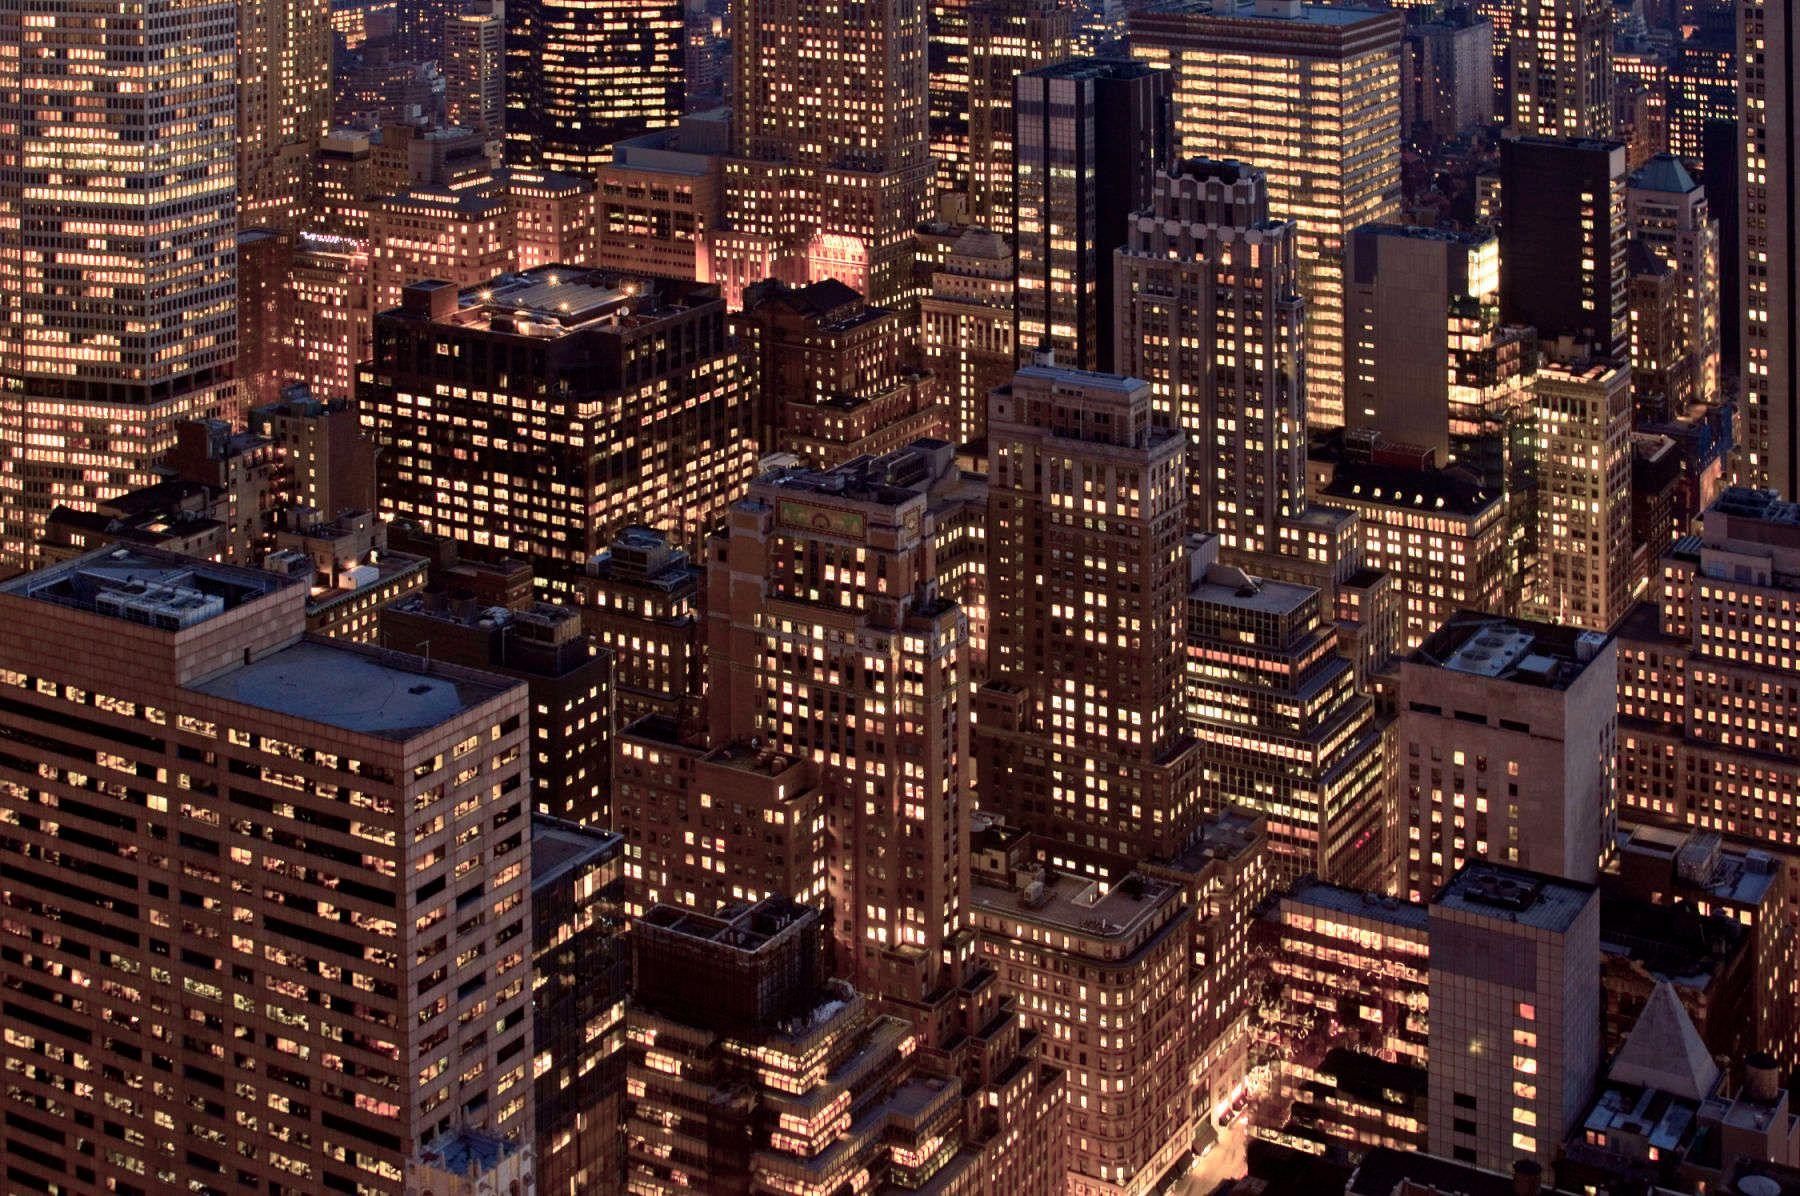 New York City Never Sleeps